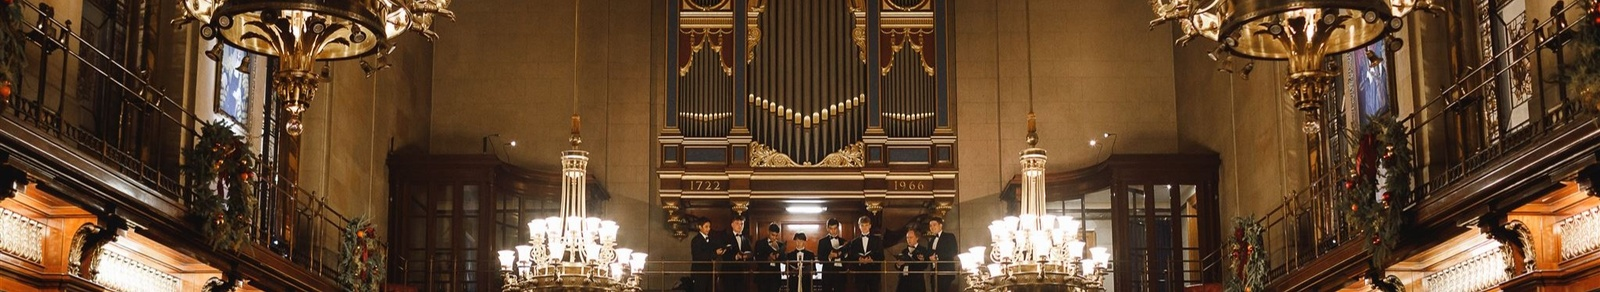 The Organ banner